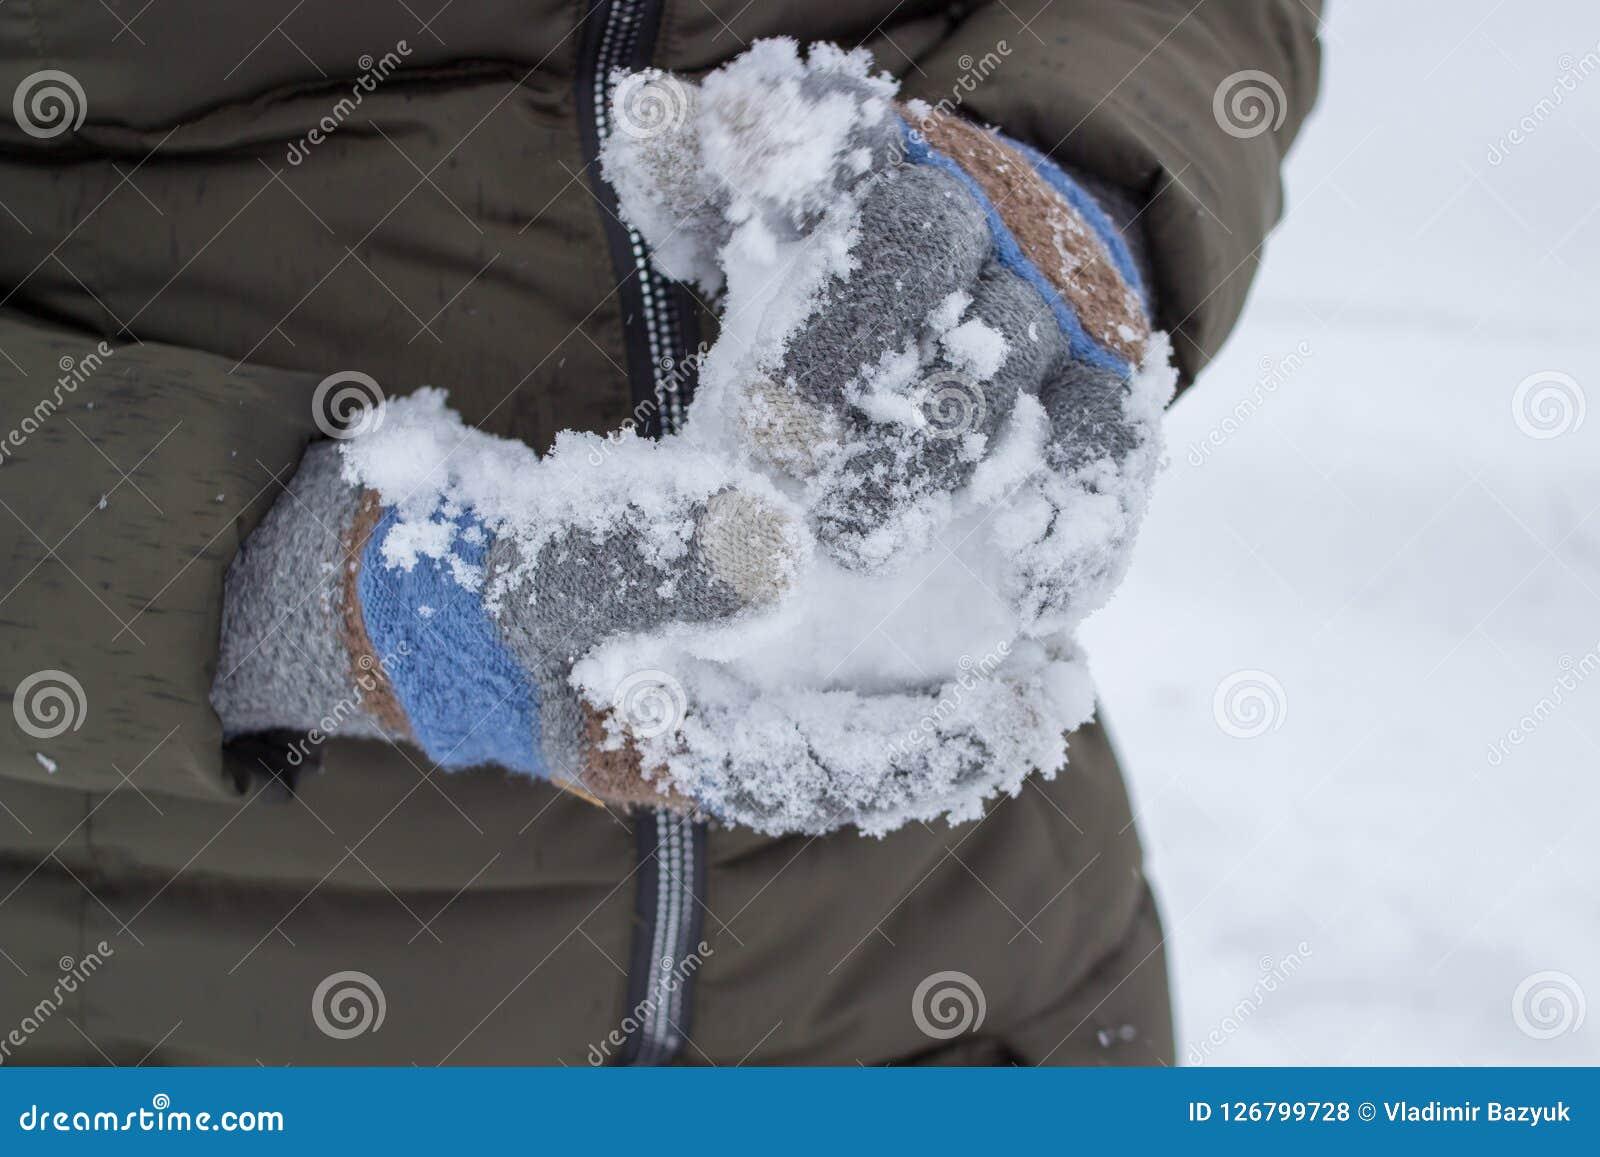 A sculpts a snowball,a woman wearing gloves takes snow